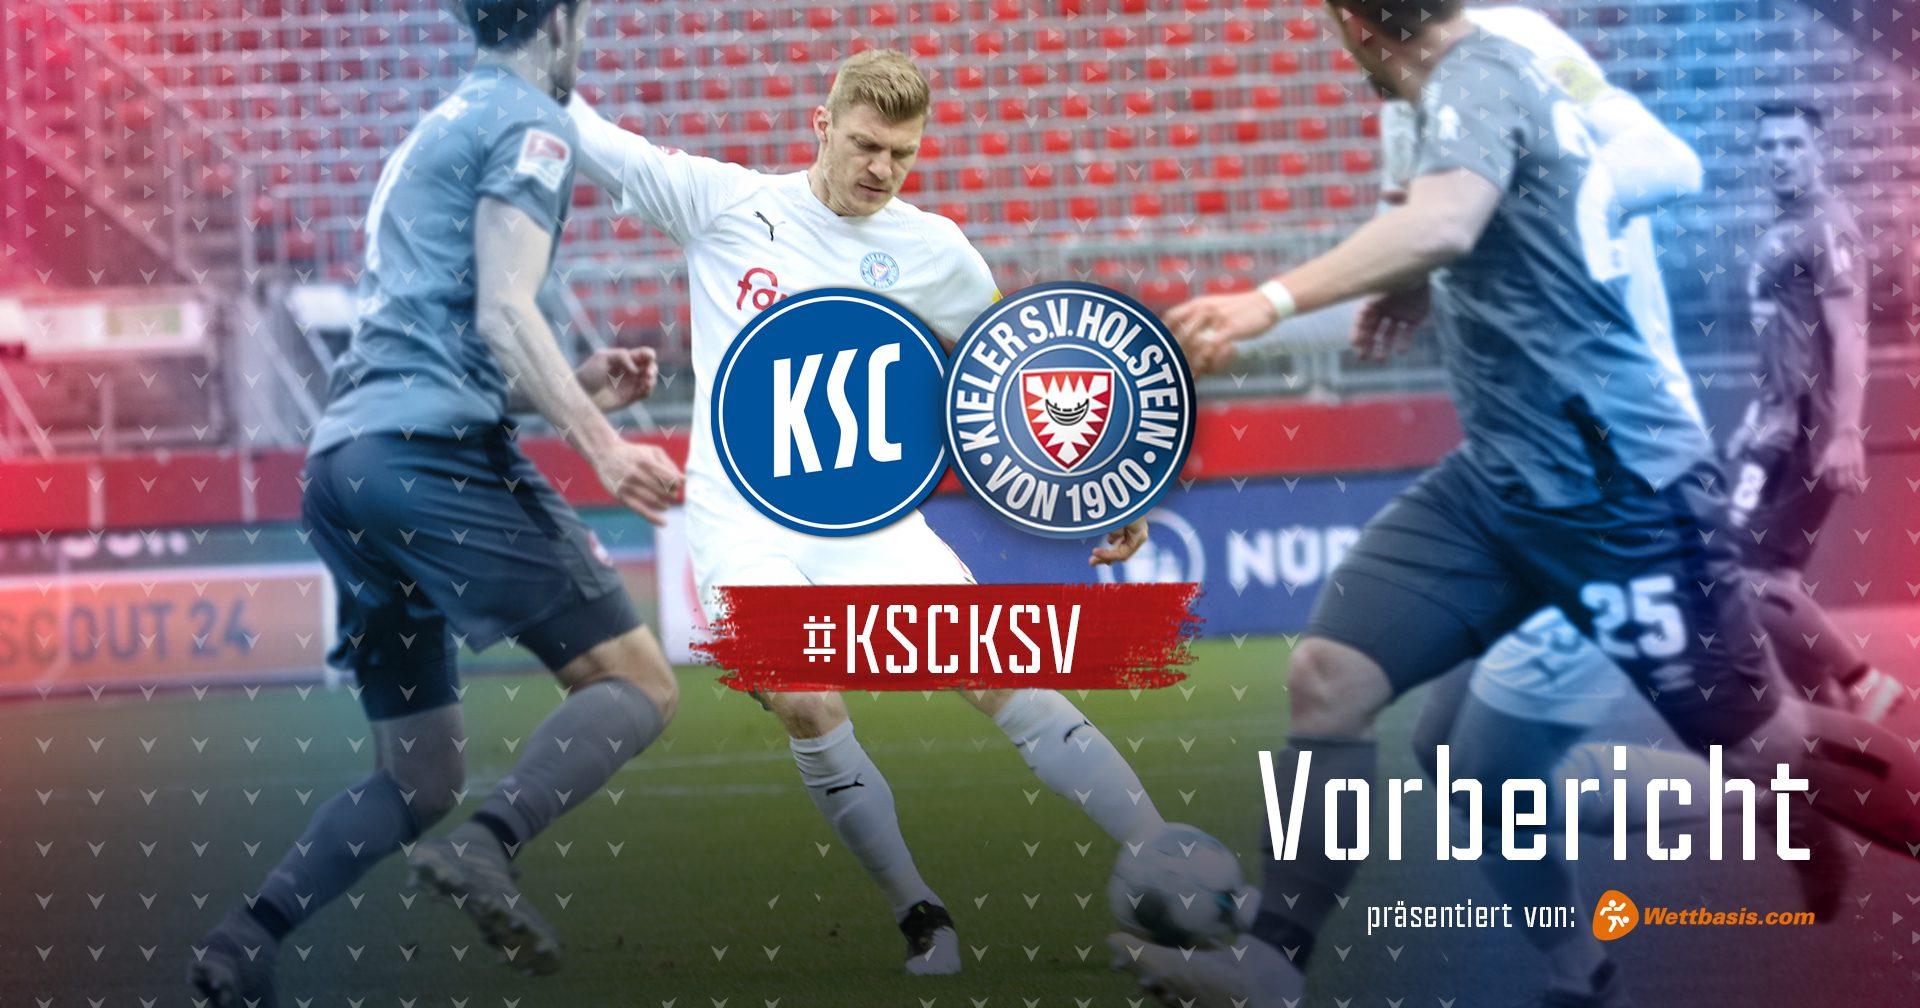 Vorbericht_KSCKSV